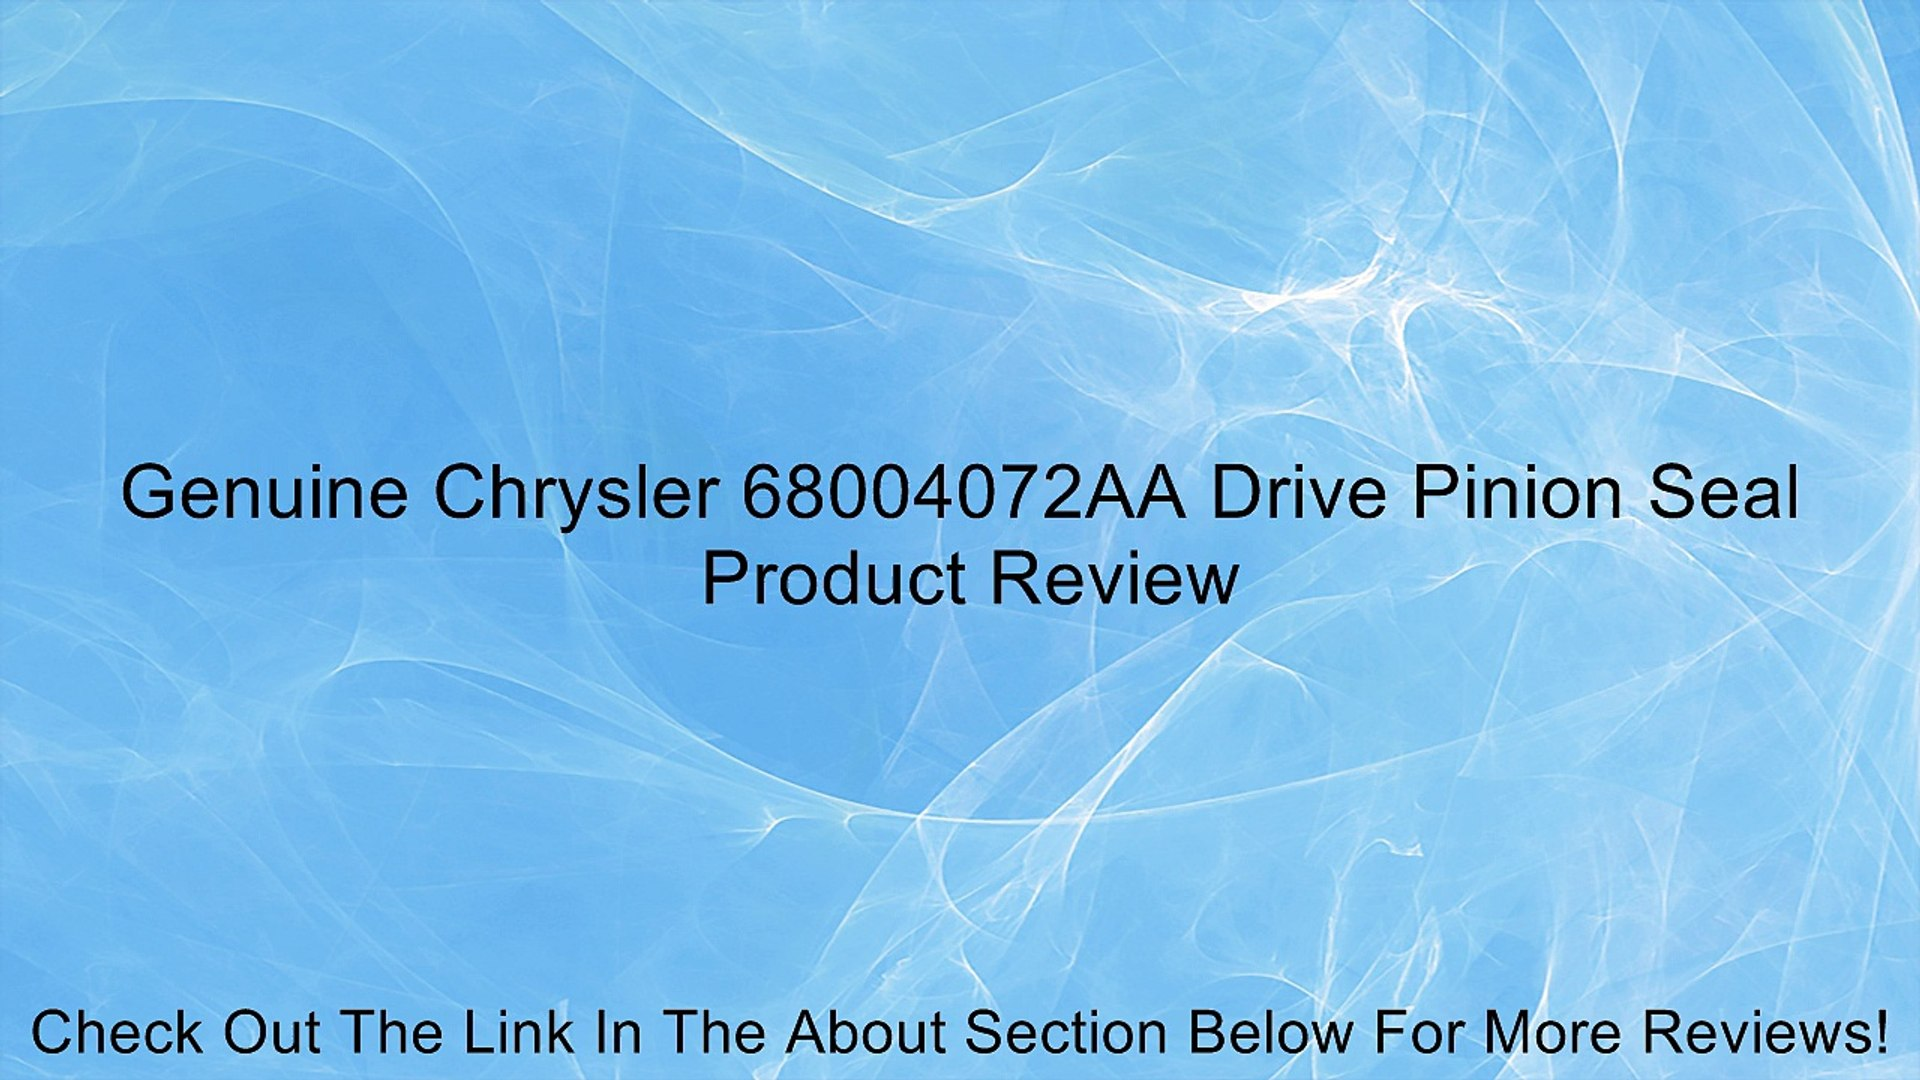 Genuine Chrysler 68004072AA Drive Pinion Seal